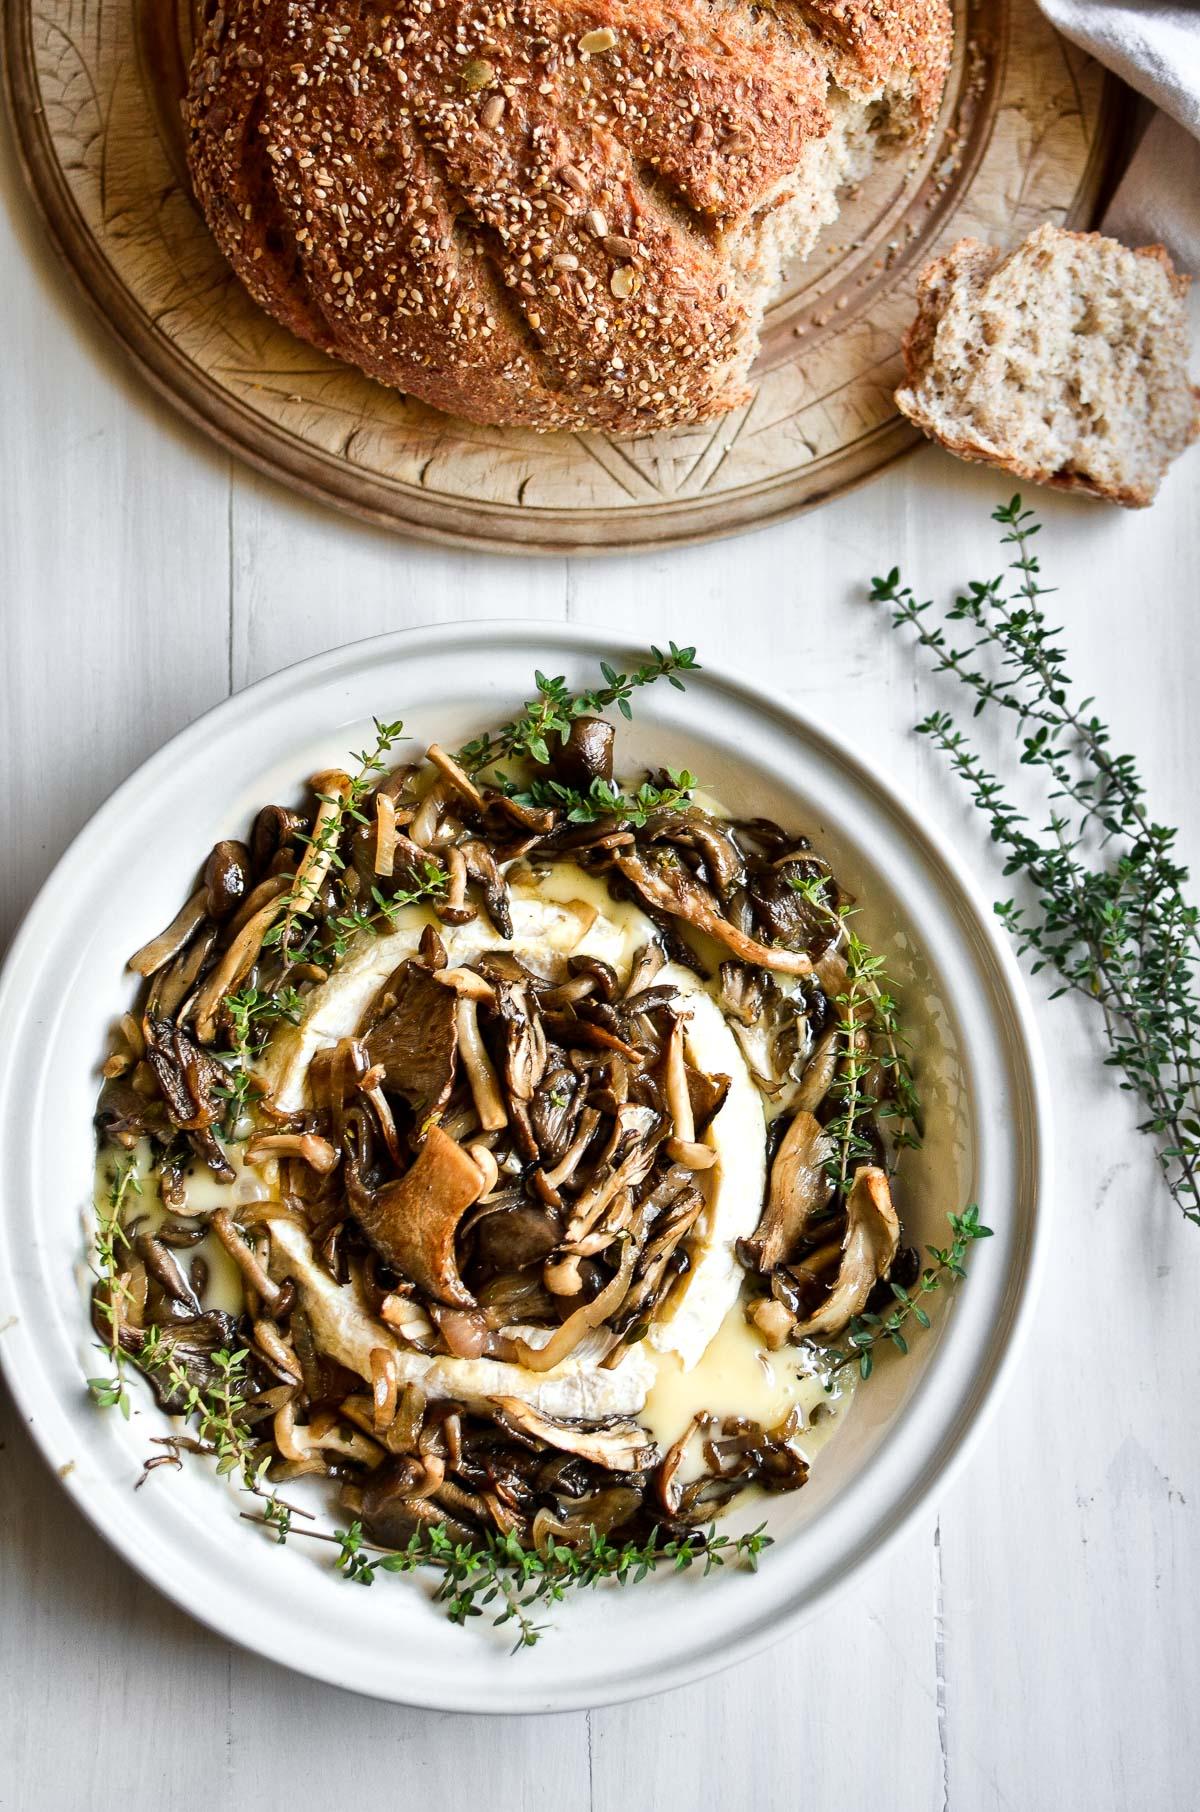 Mushroom and Hazelnut Baked Brie